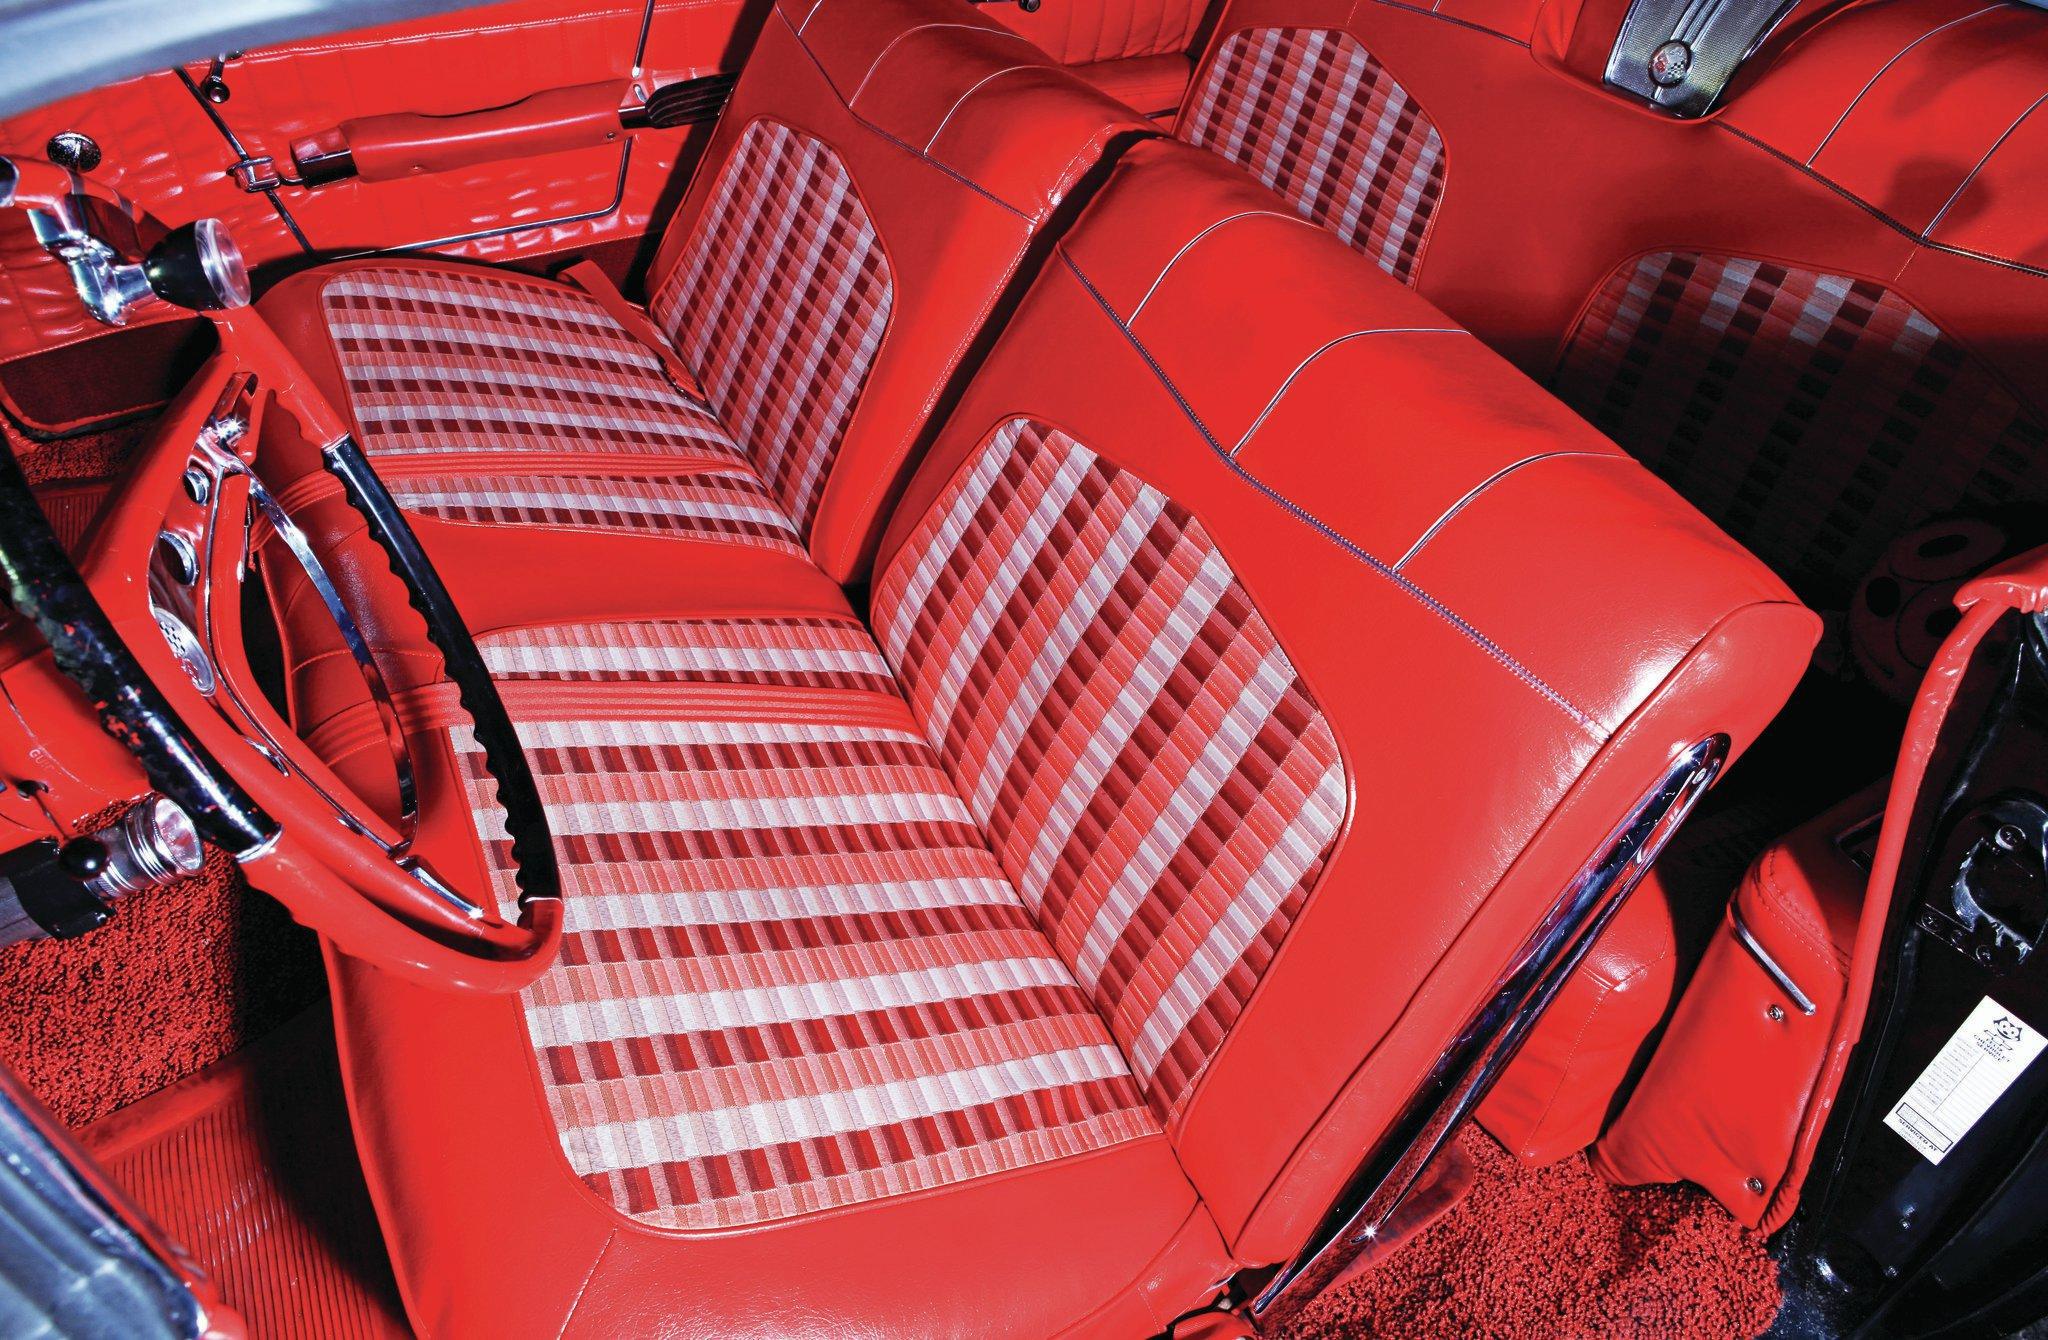 1959-chevrolet-impala-classic-industries-1959-impala-red-kit